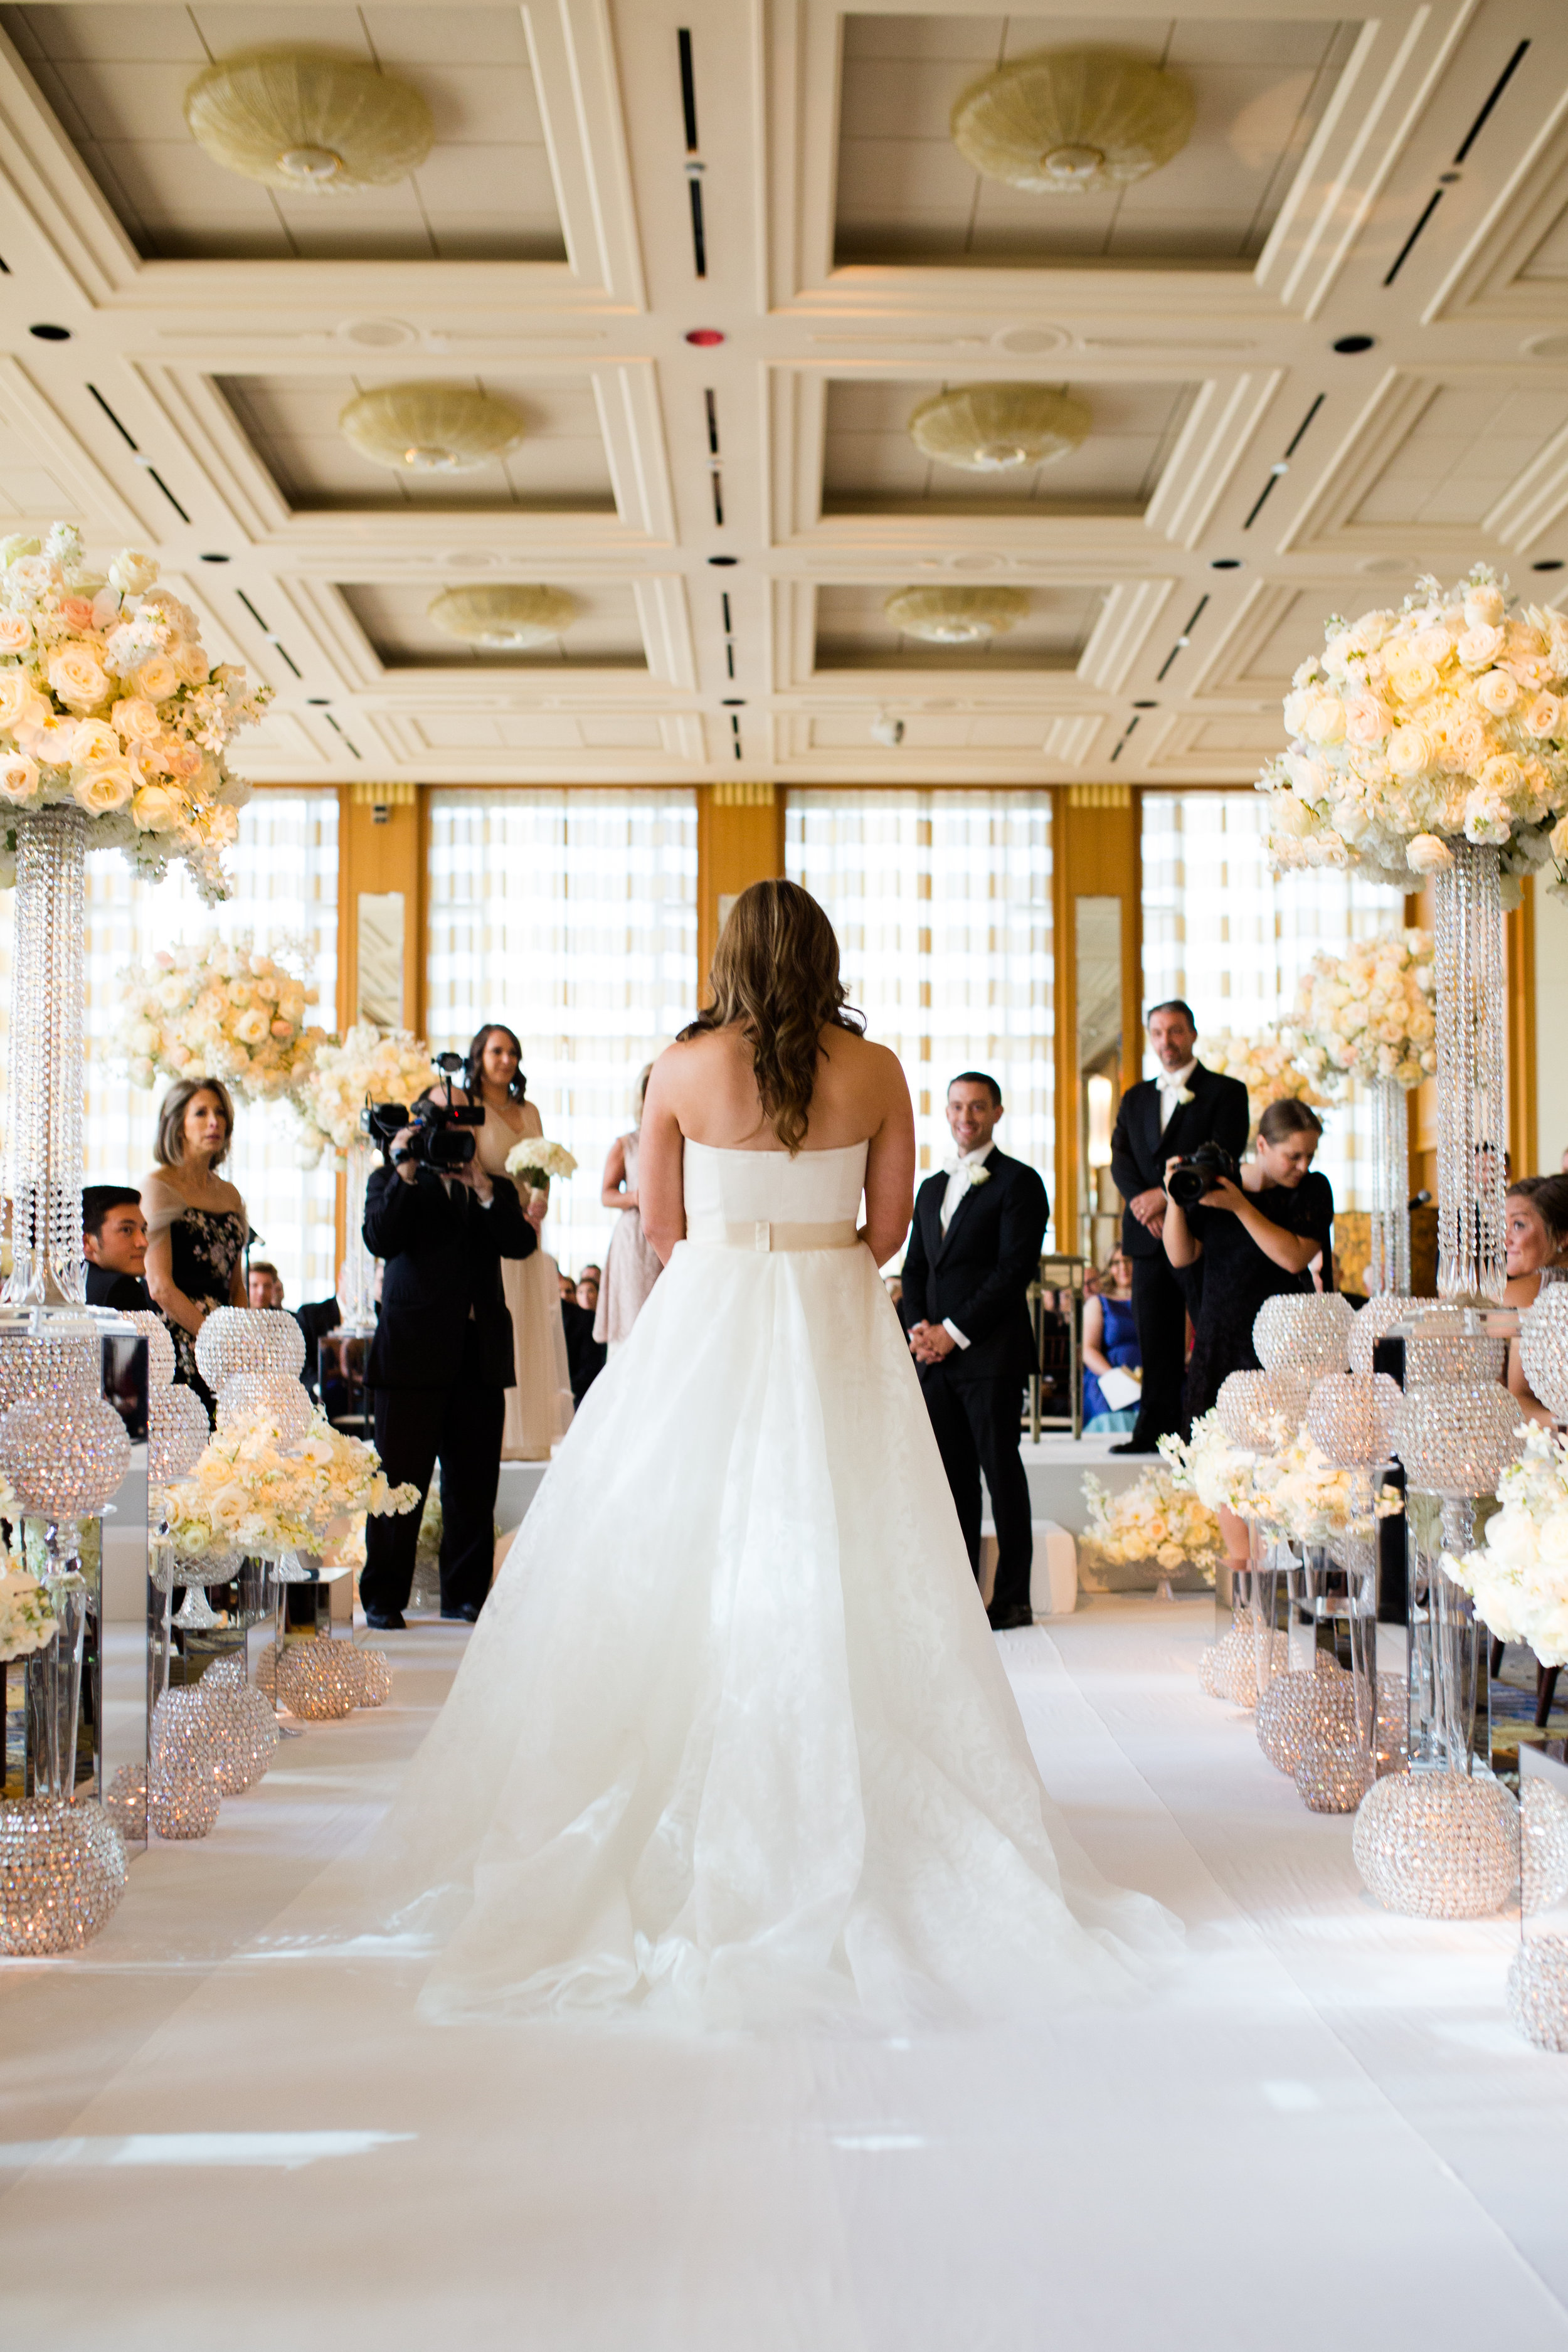 Wedding Ceremony at the Peninsula